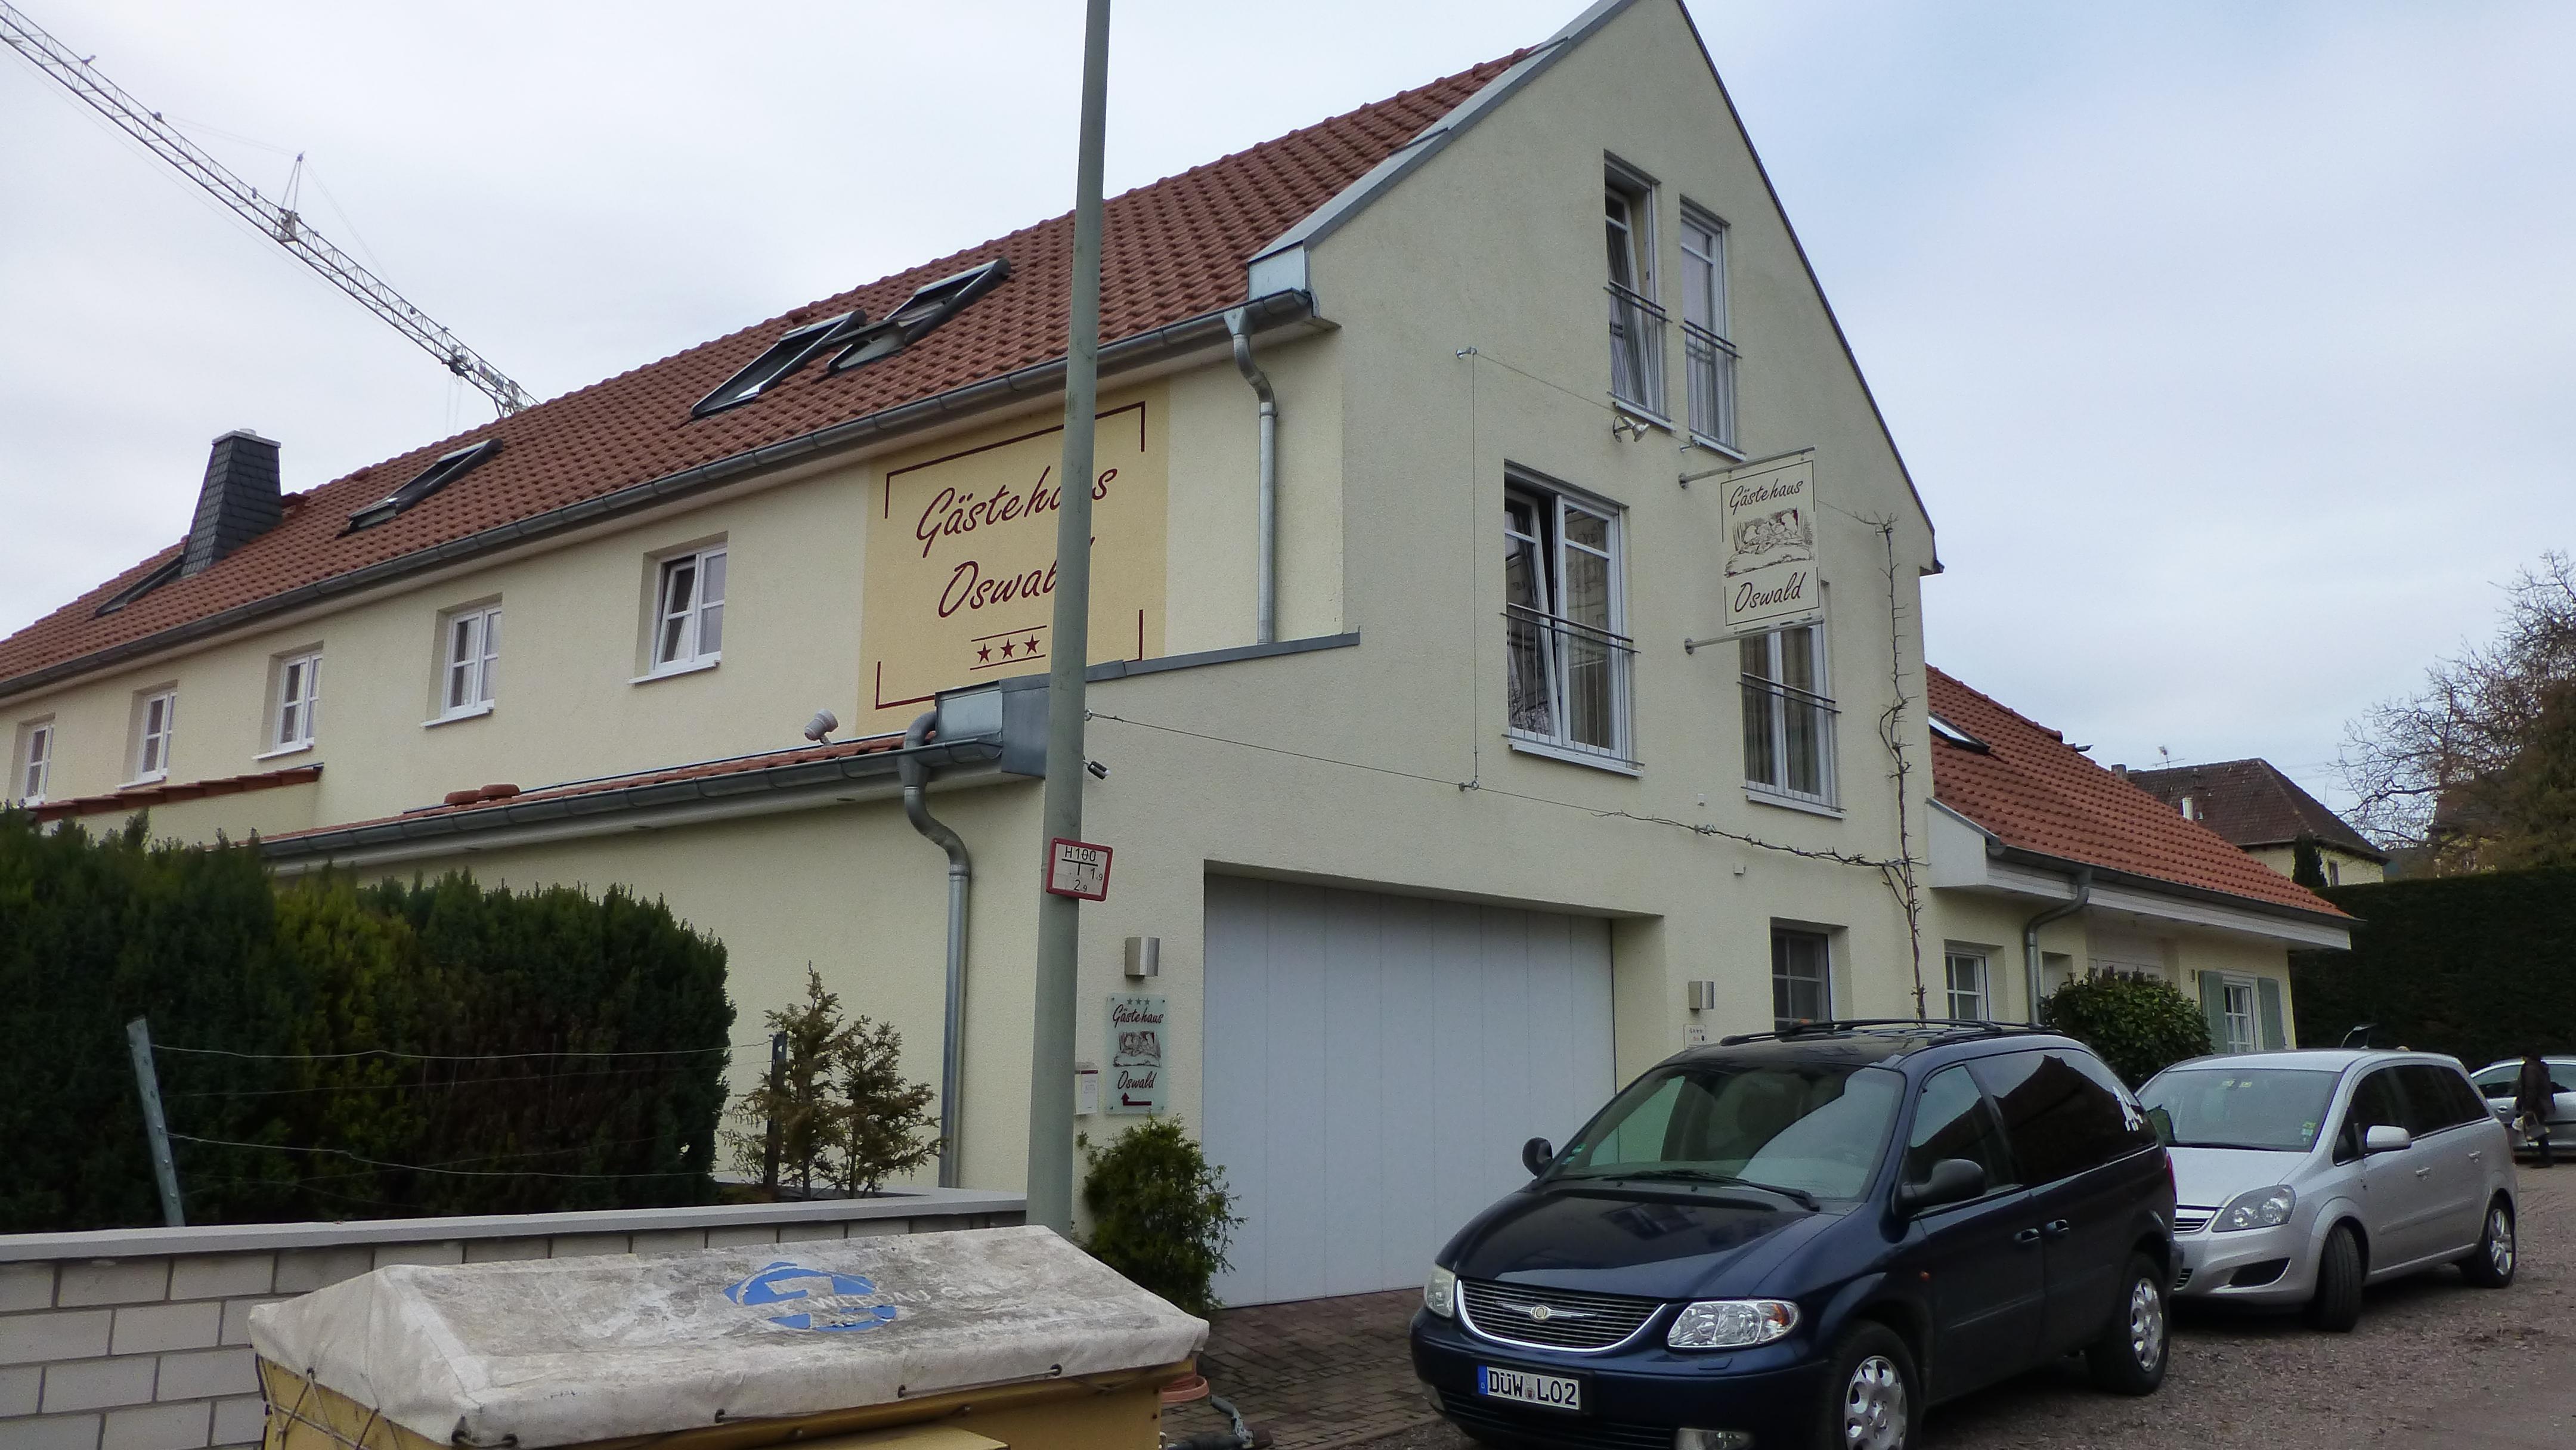 Gaesthaus Oswald